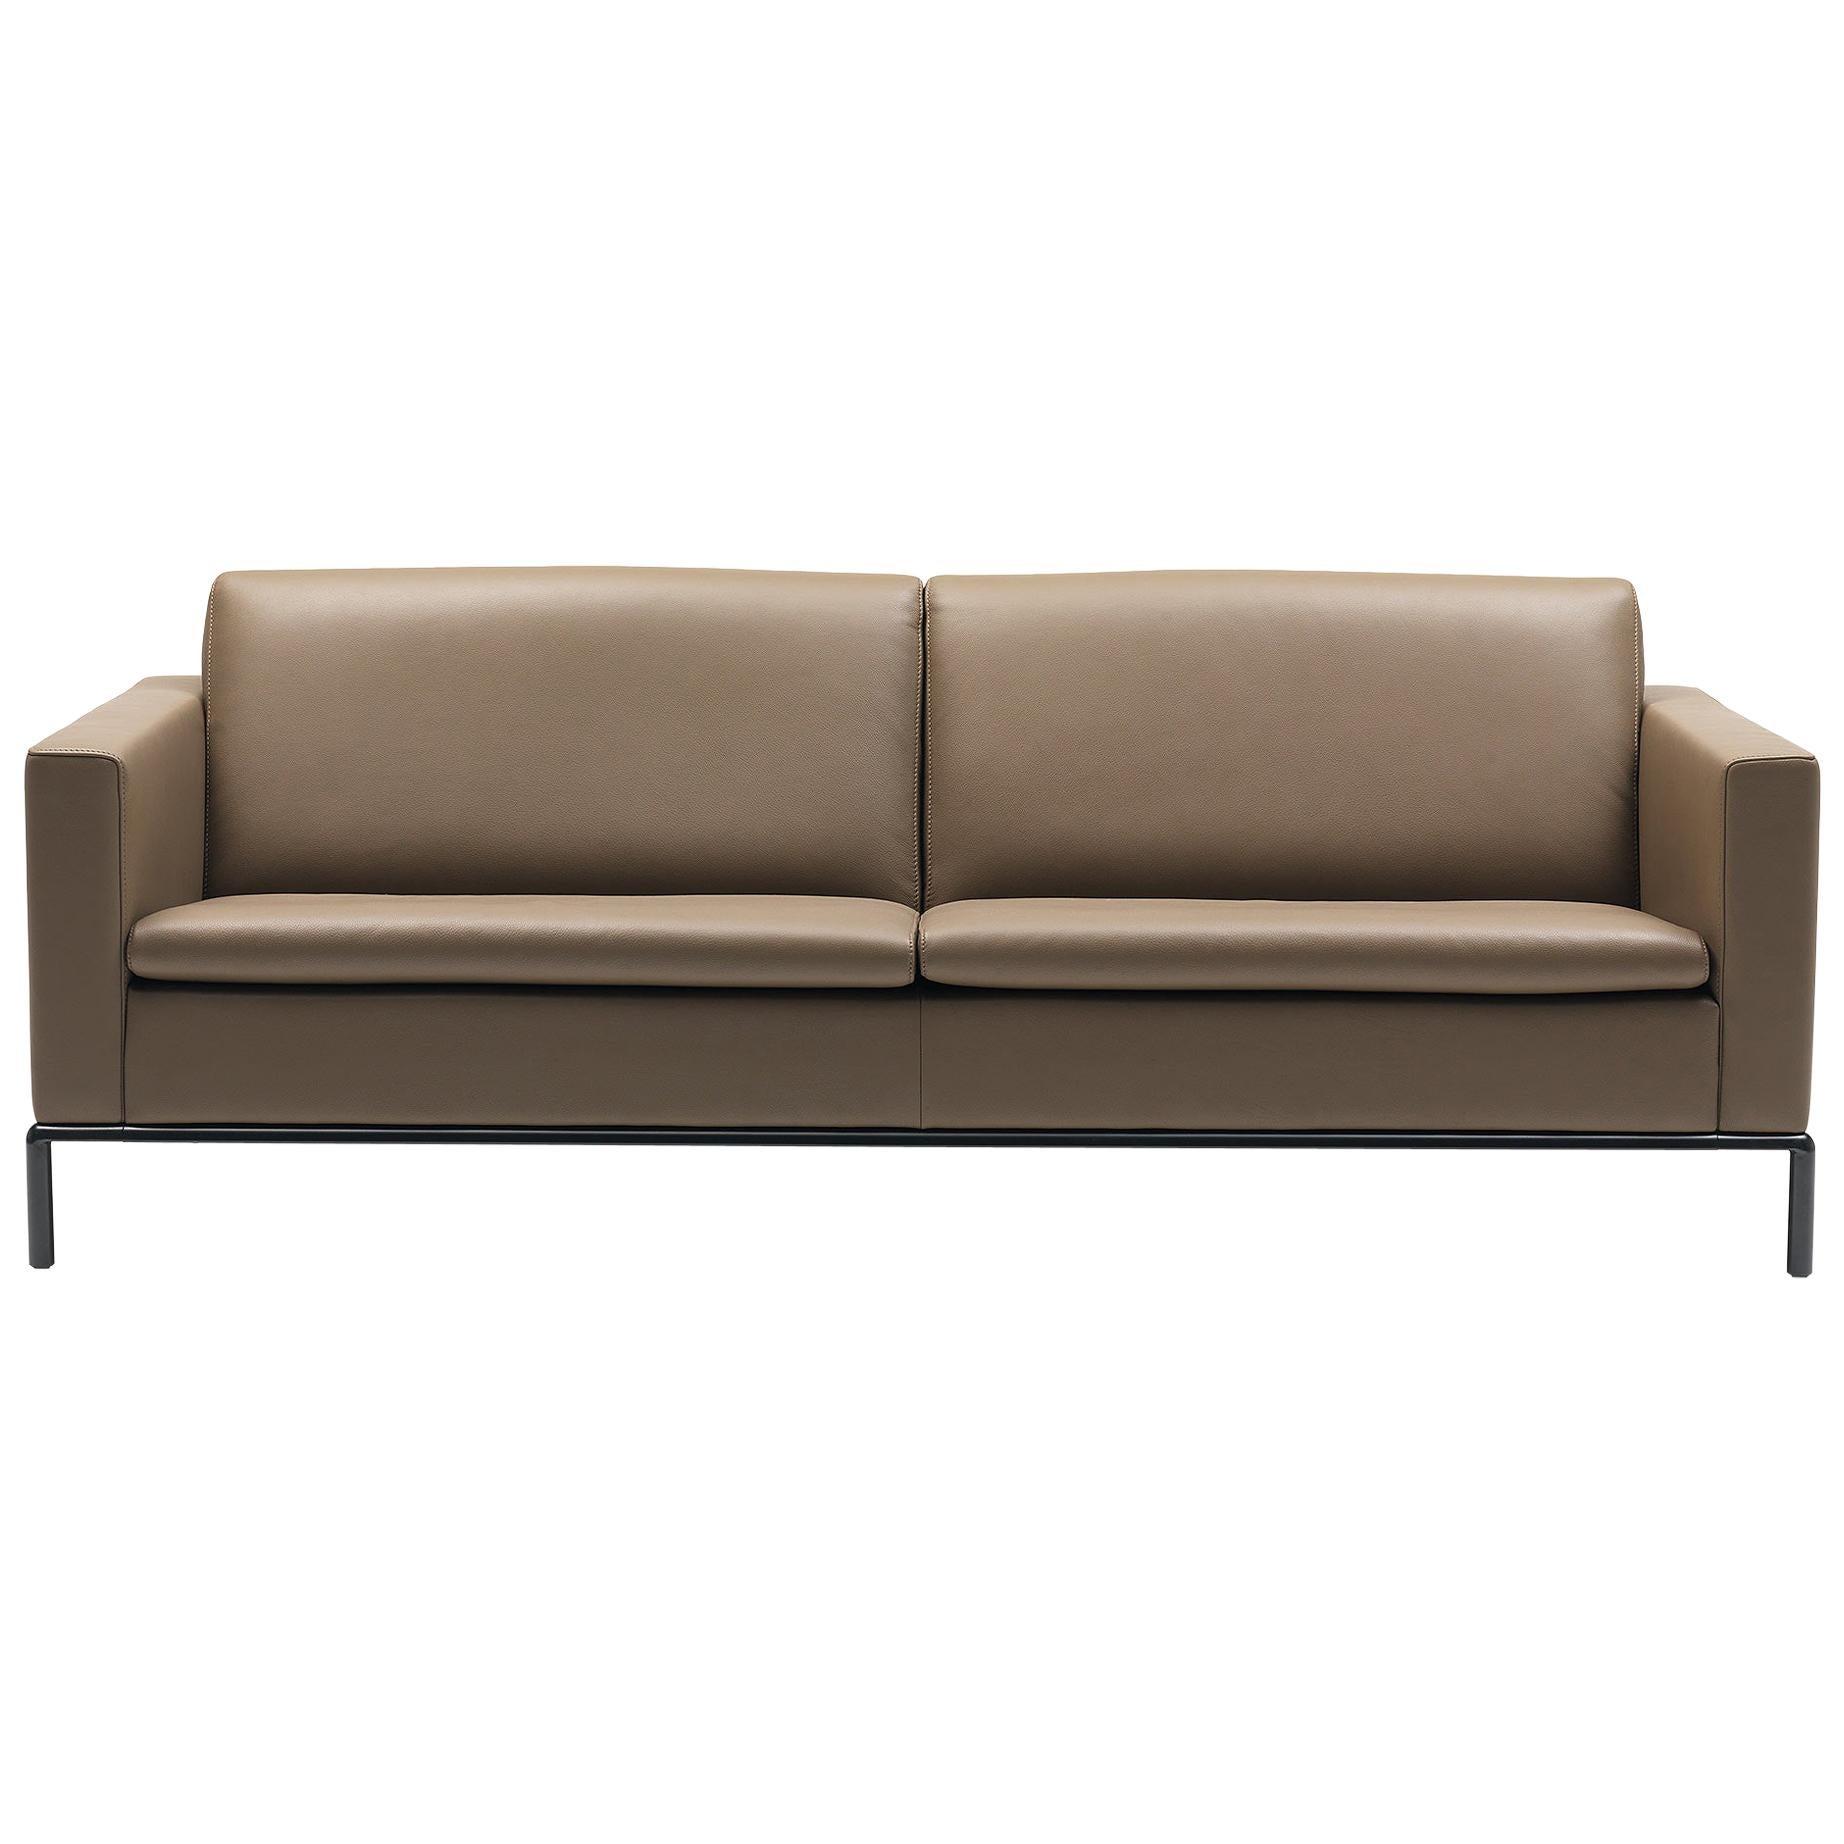 De Sede DS-4 Three-Seat Sofa in Olive Upholstery by Antonella Scarpitta